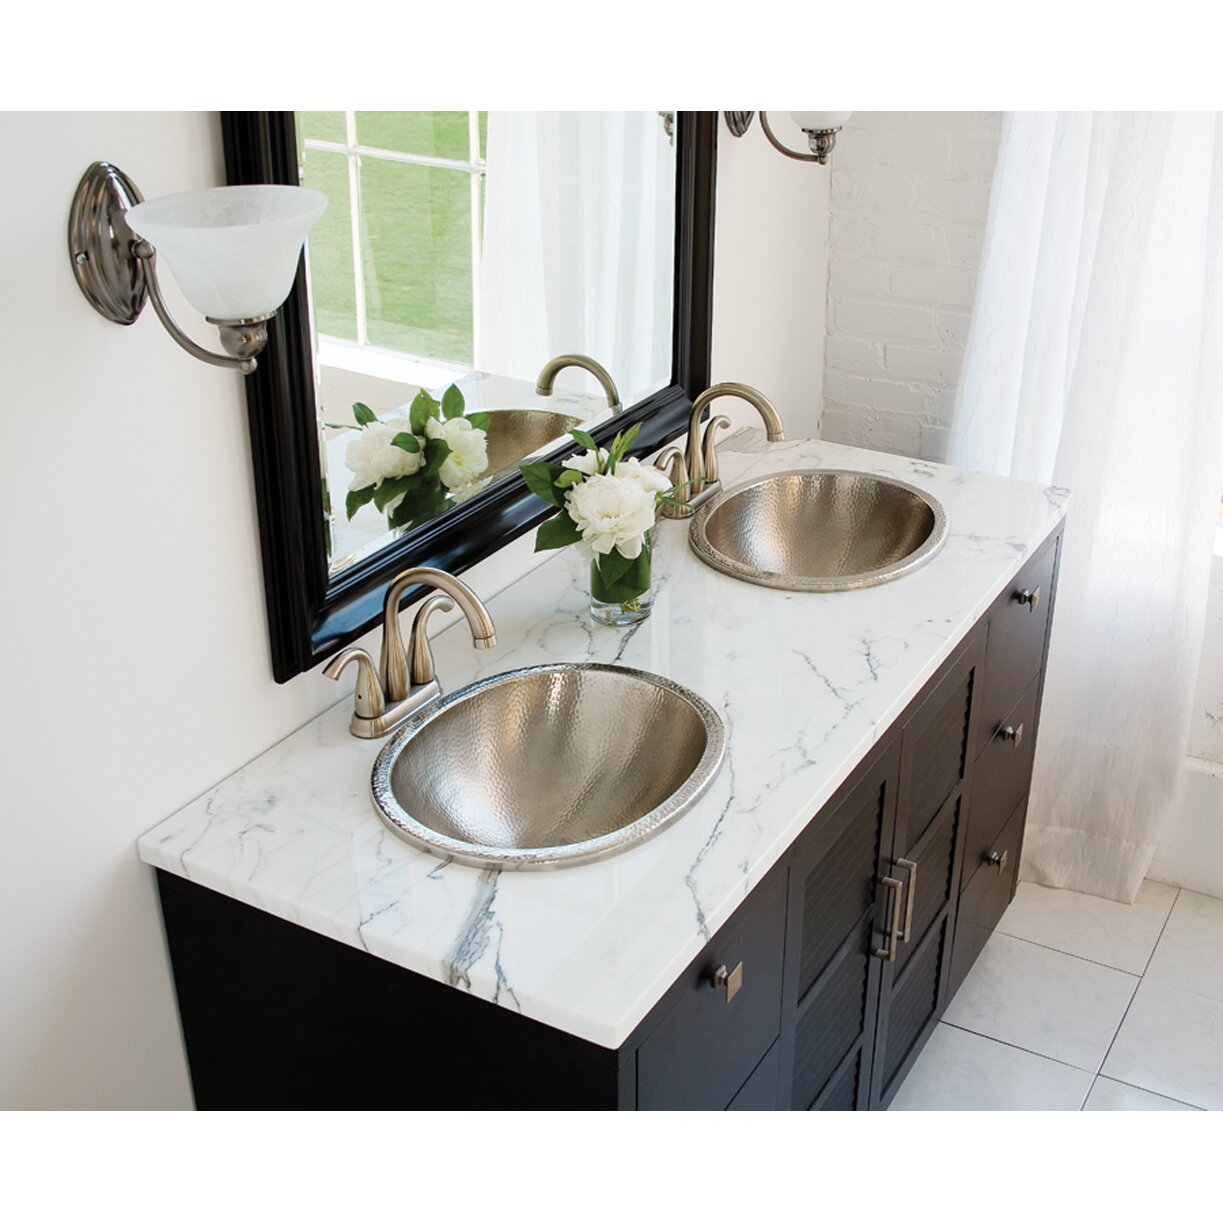 Sinkology Oval Bathroom Undermount Sink Reviews Wayfair